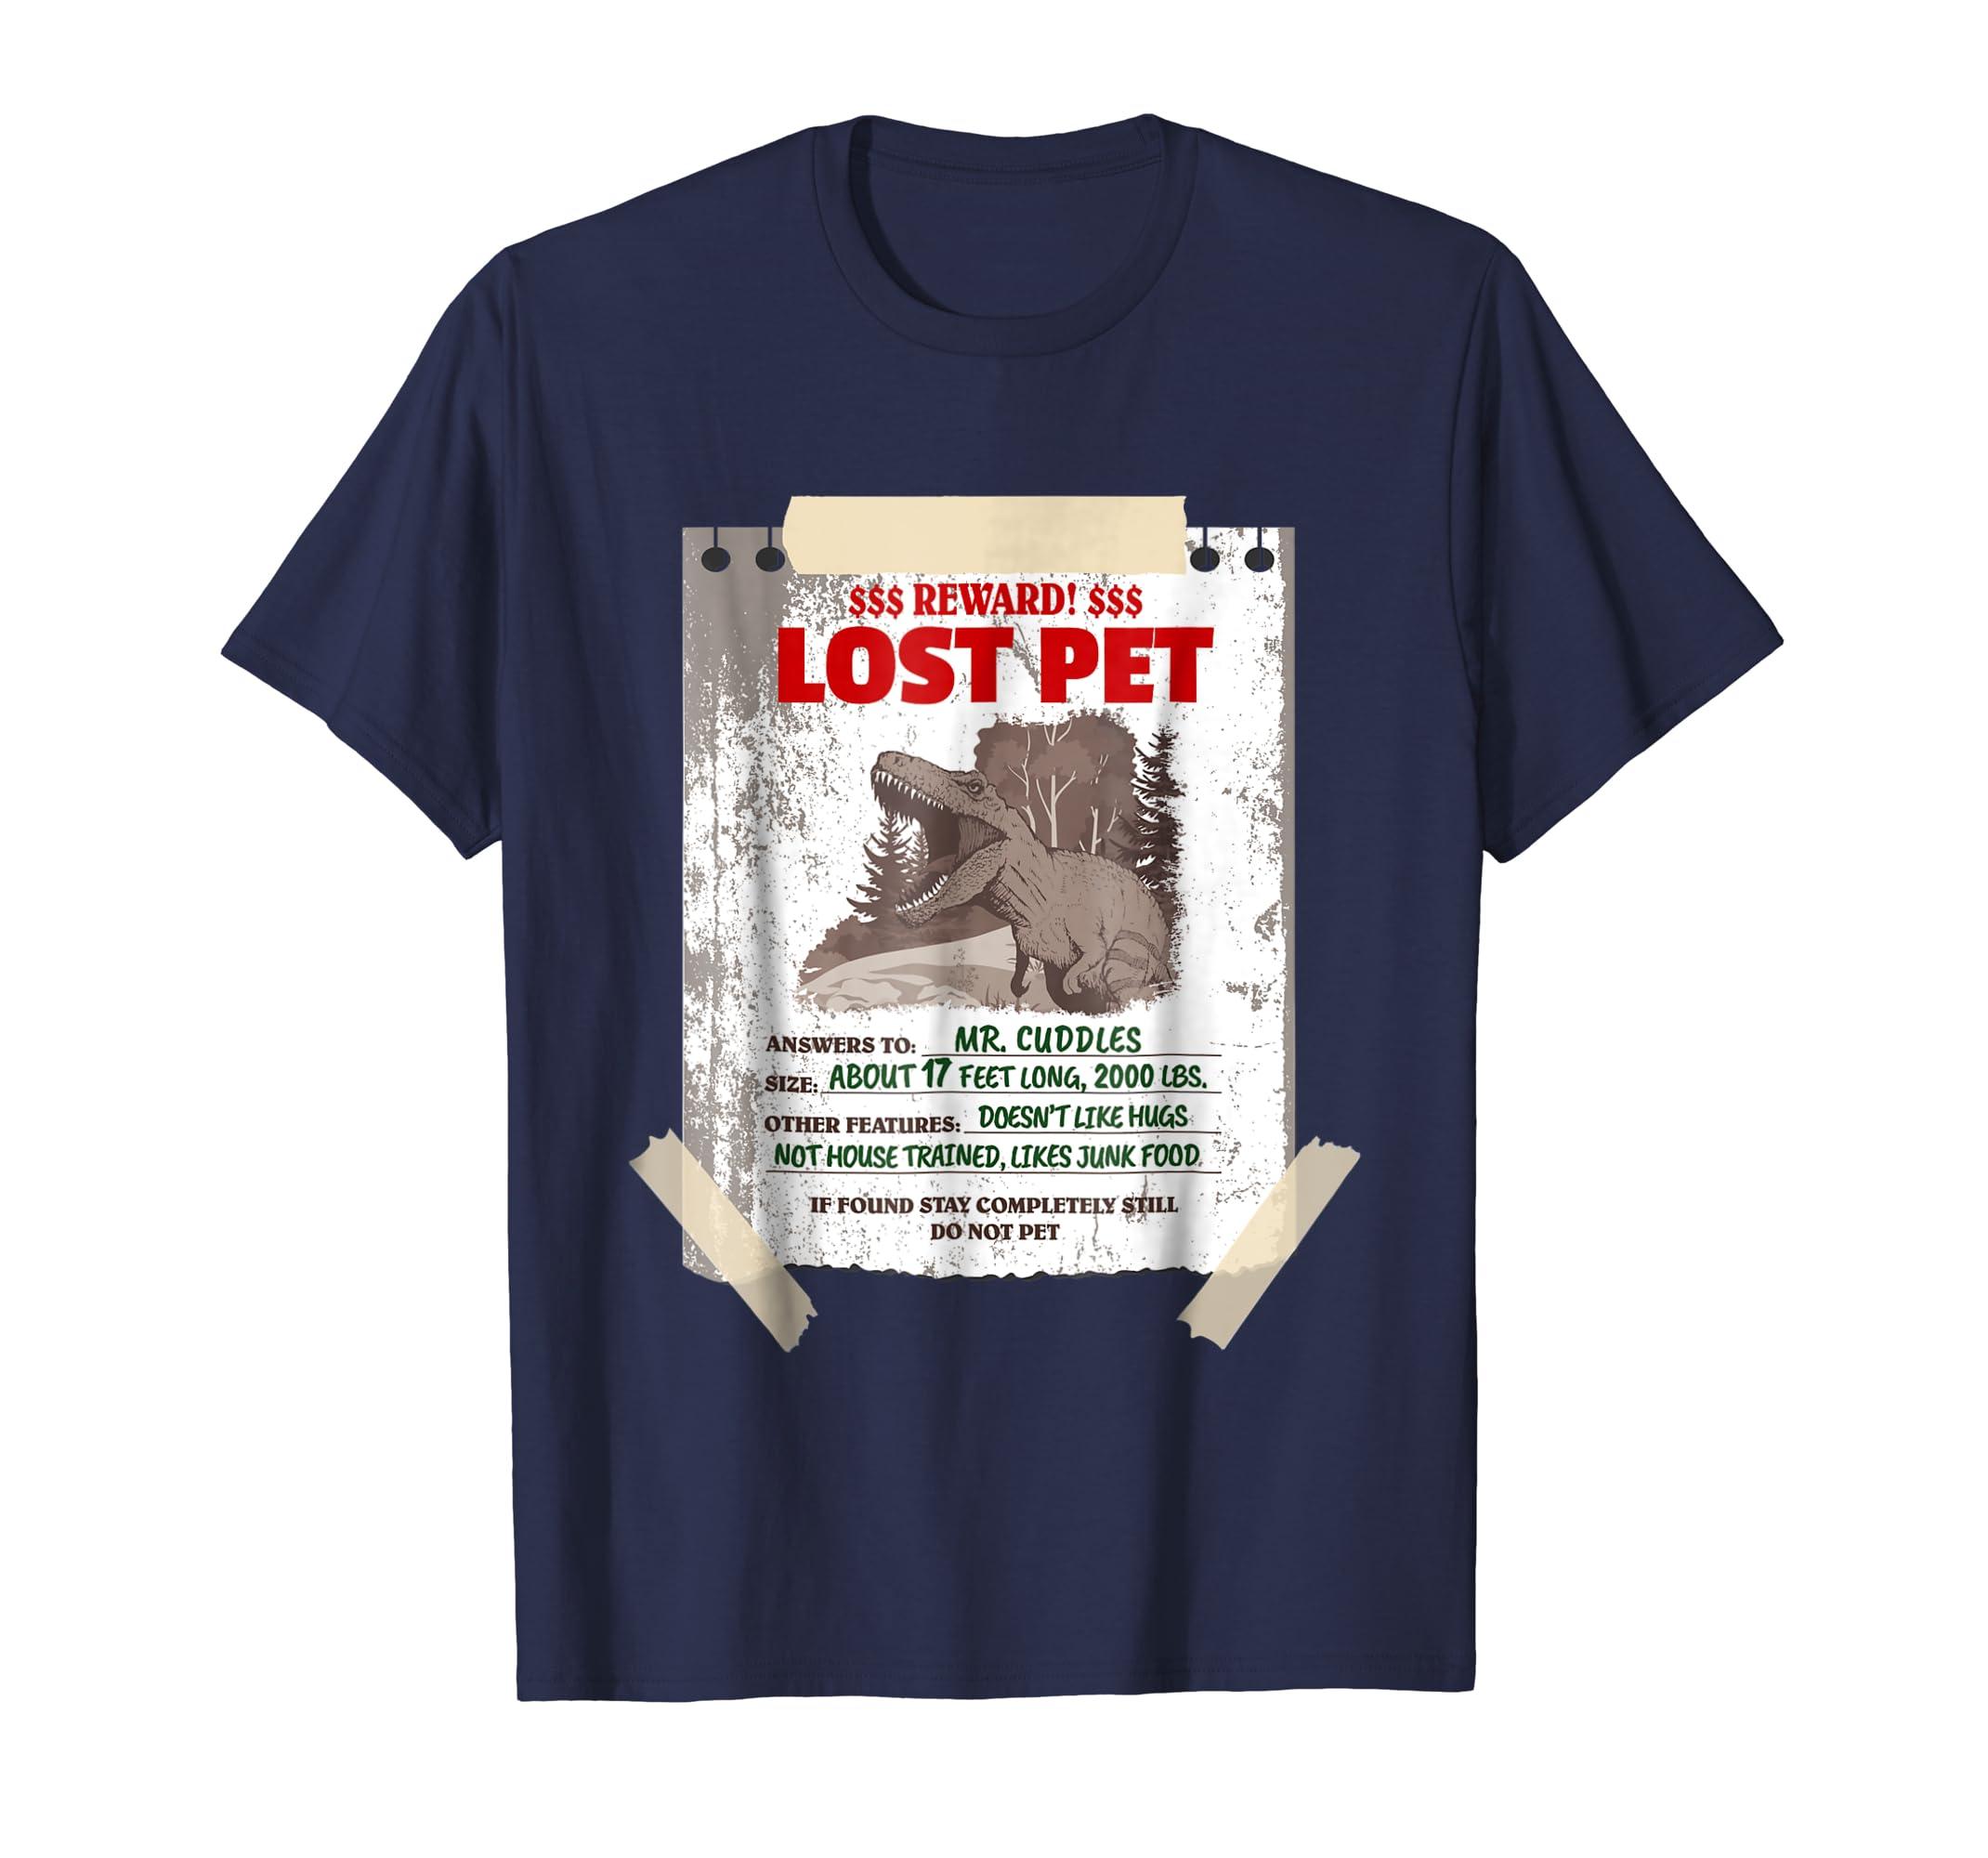 d658de6f41f Amazon.com  Lost Pet Tyrannosaurus Dinosaur Dino T Rex Wanted T-Shirt   Clothing